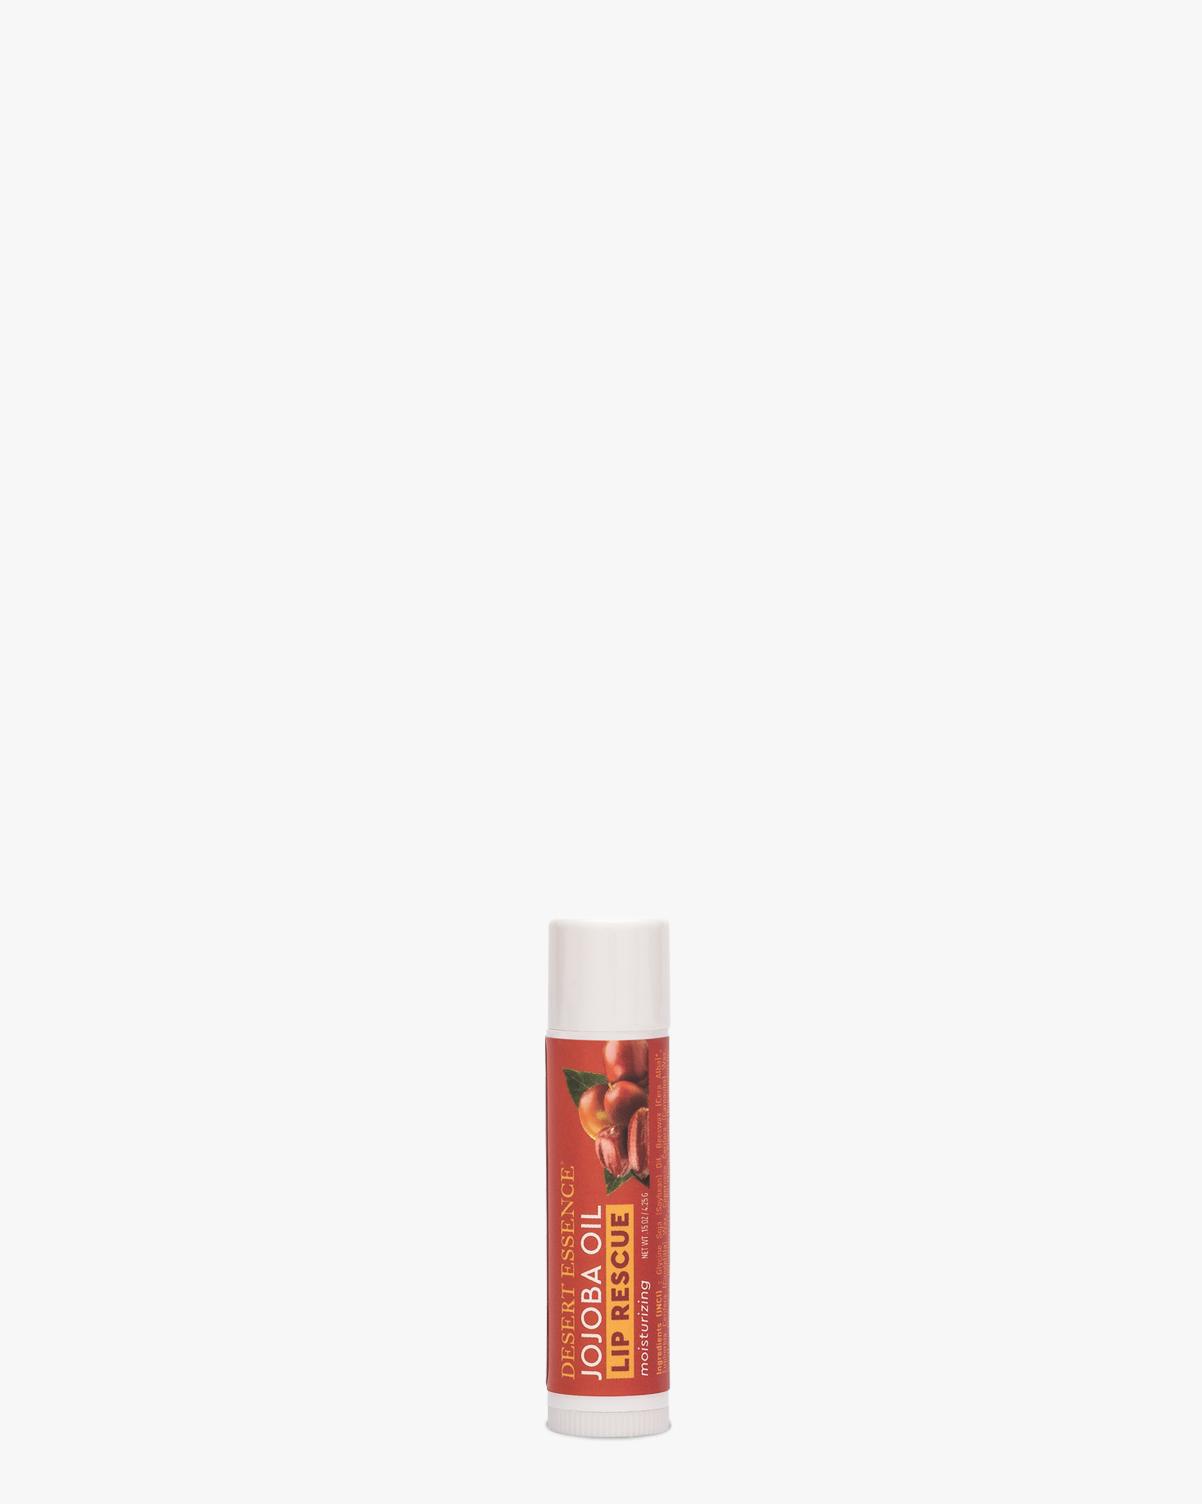 Desert Essence coupon: Desert Essence Lip Rescue Moisturizing - Jojoba Oil Lip Balm | Gluten-Free